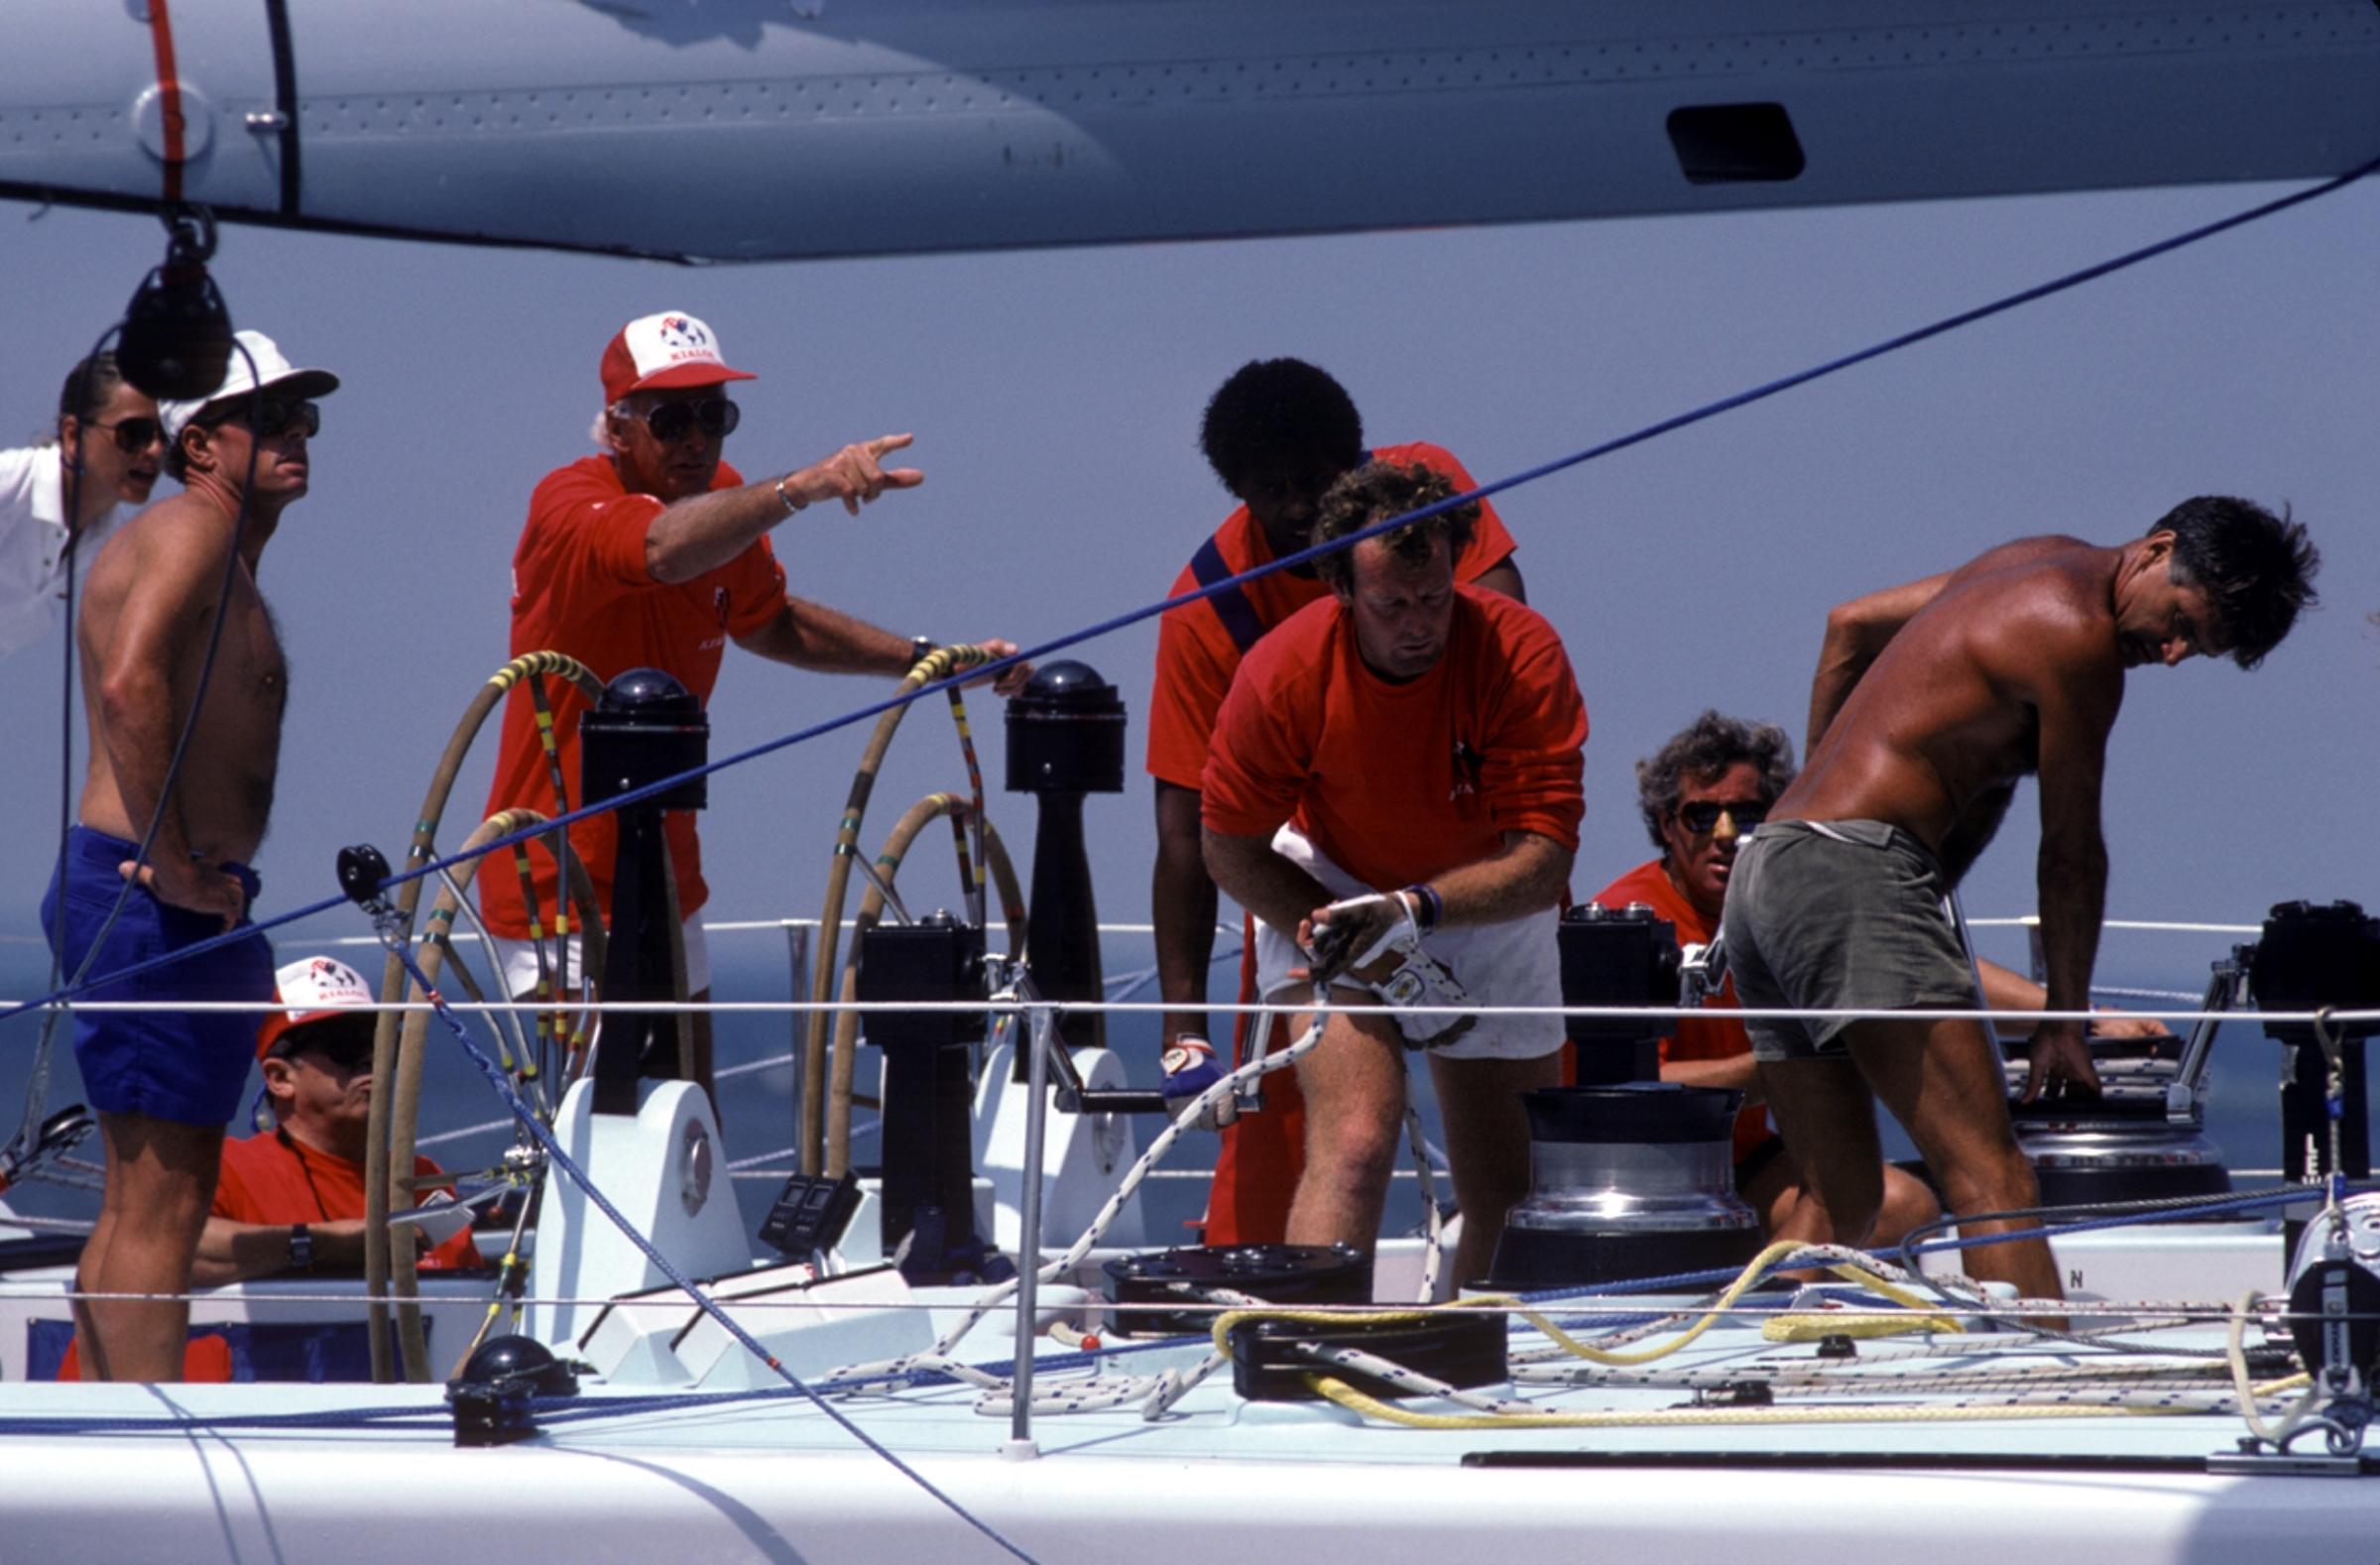 1980s, Kialoa V crew